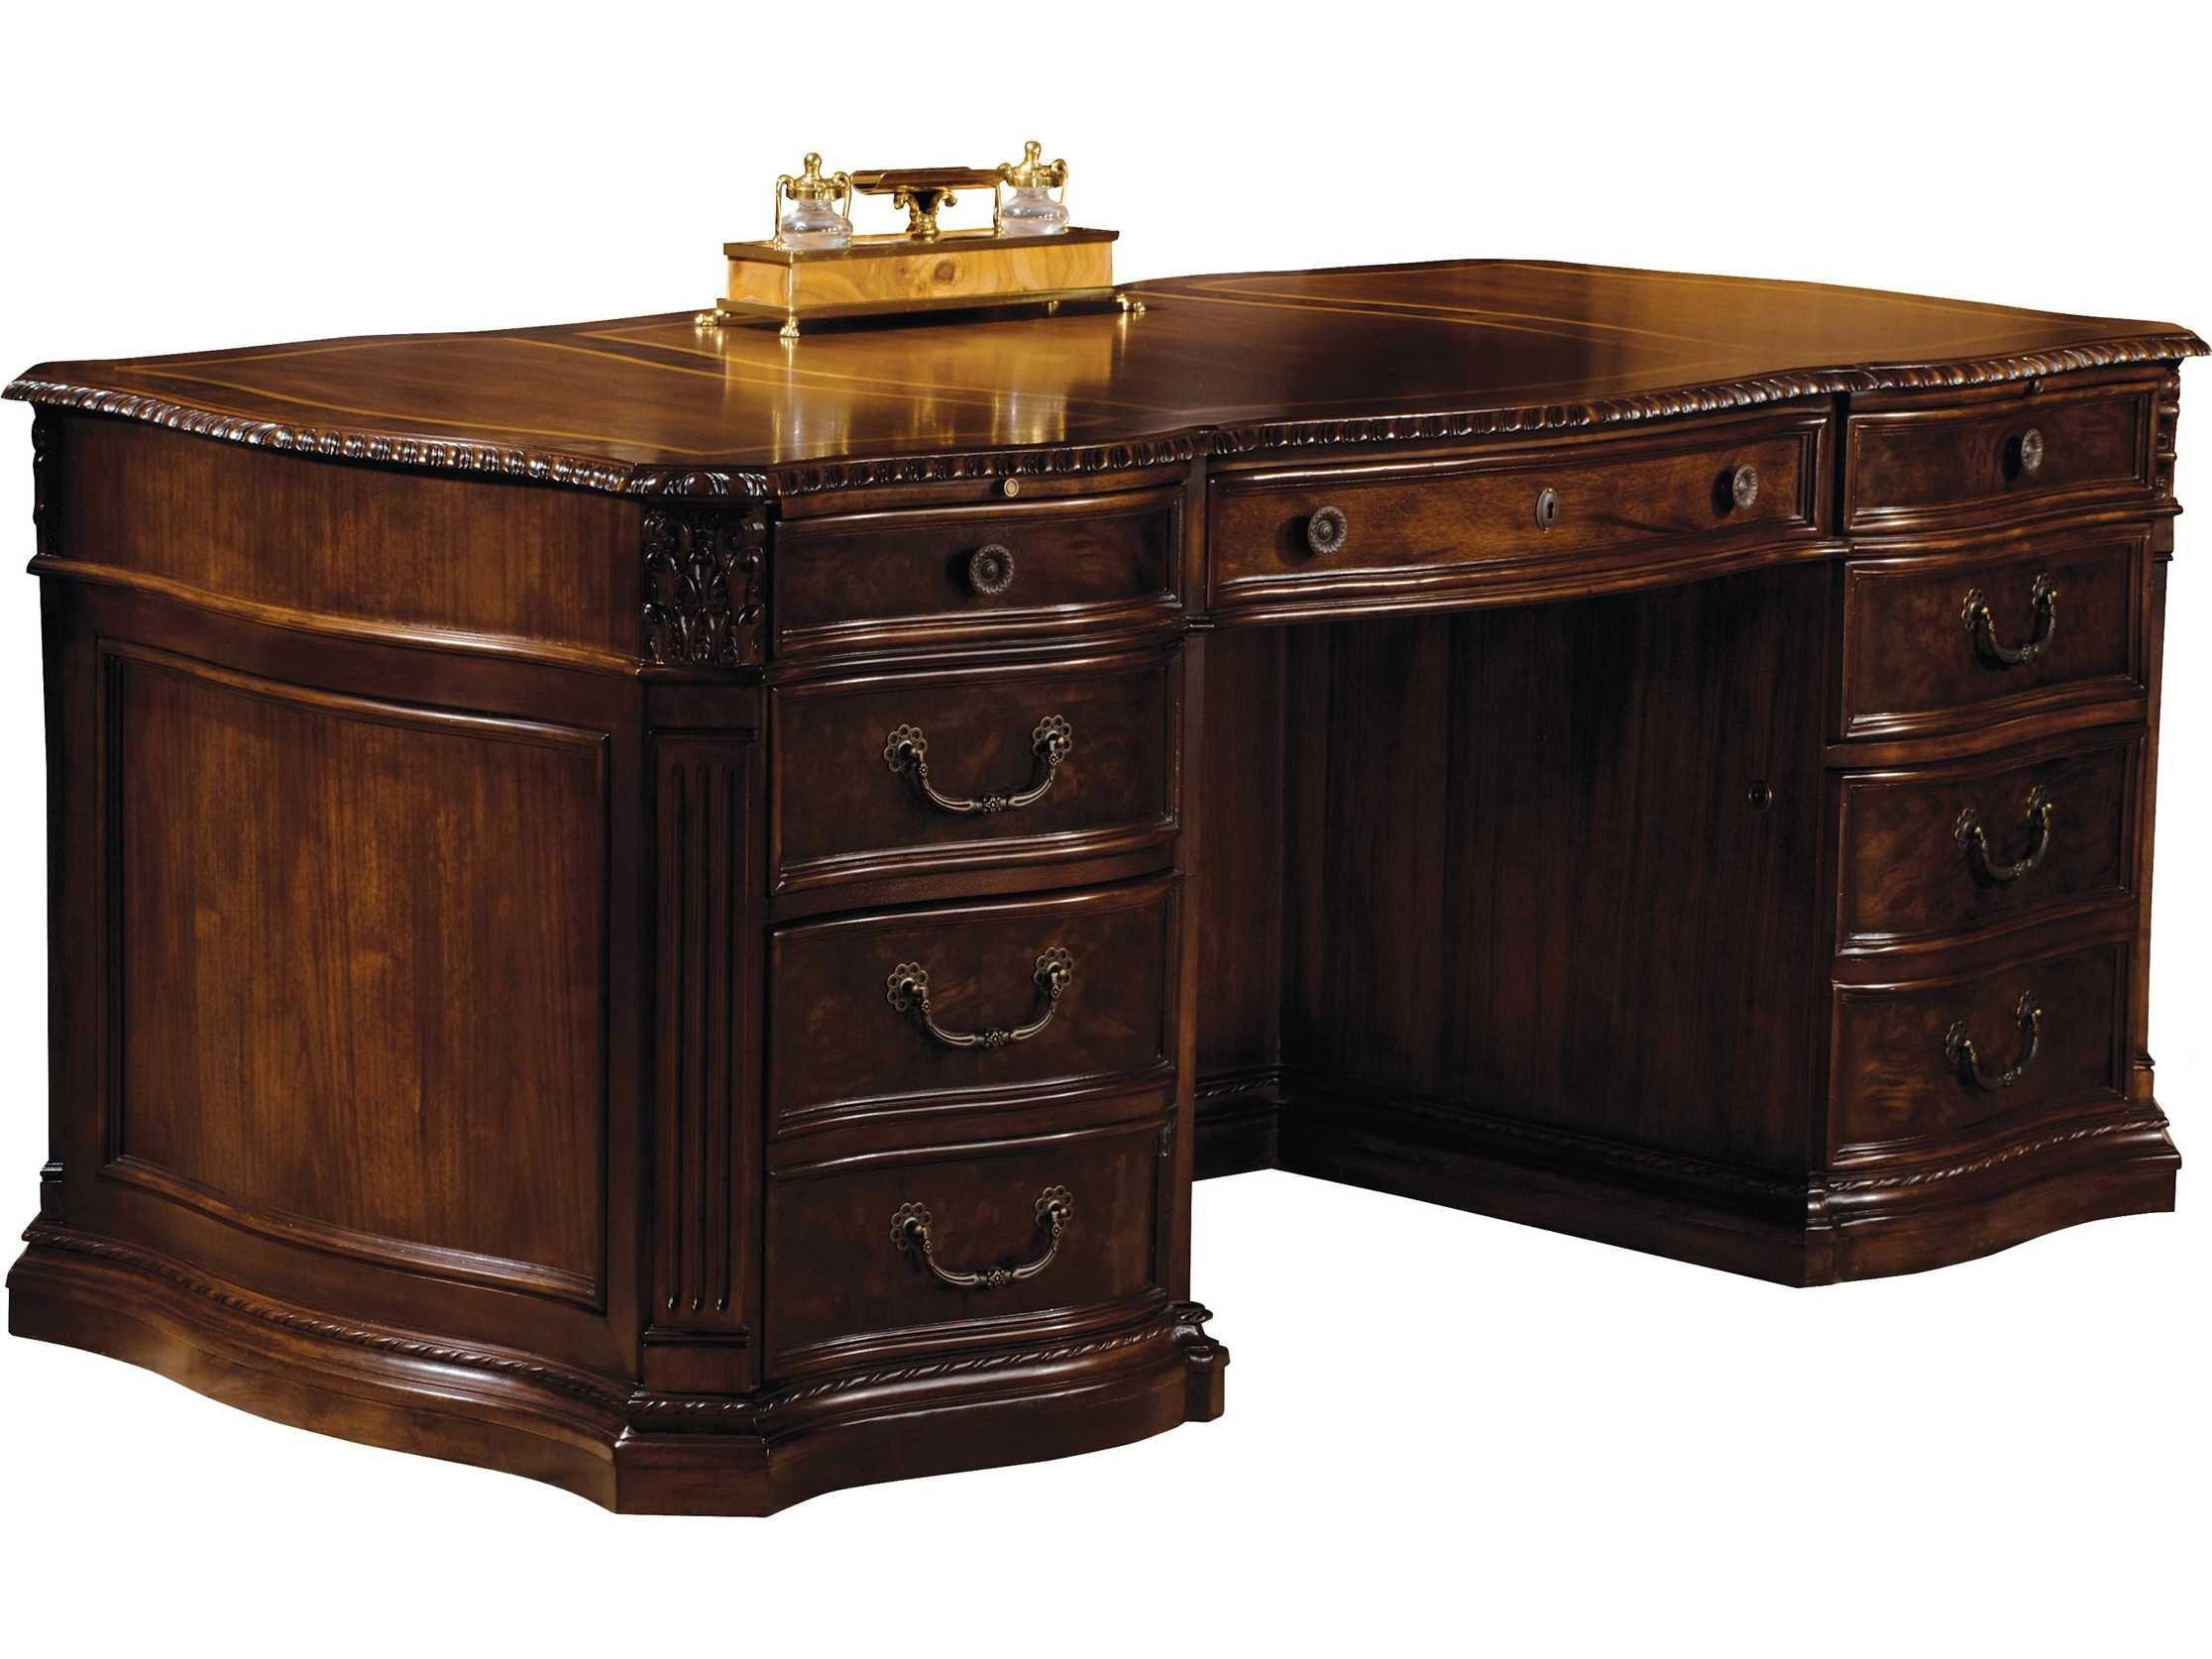 Hekman Office 72 X 36 Executive Desk In Old World Walnut Burl